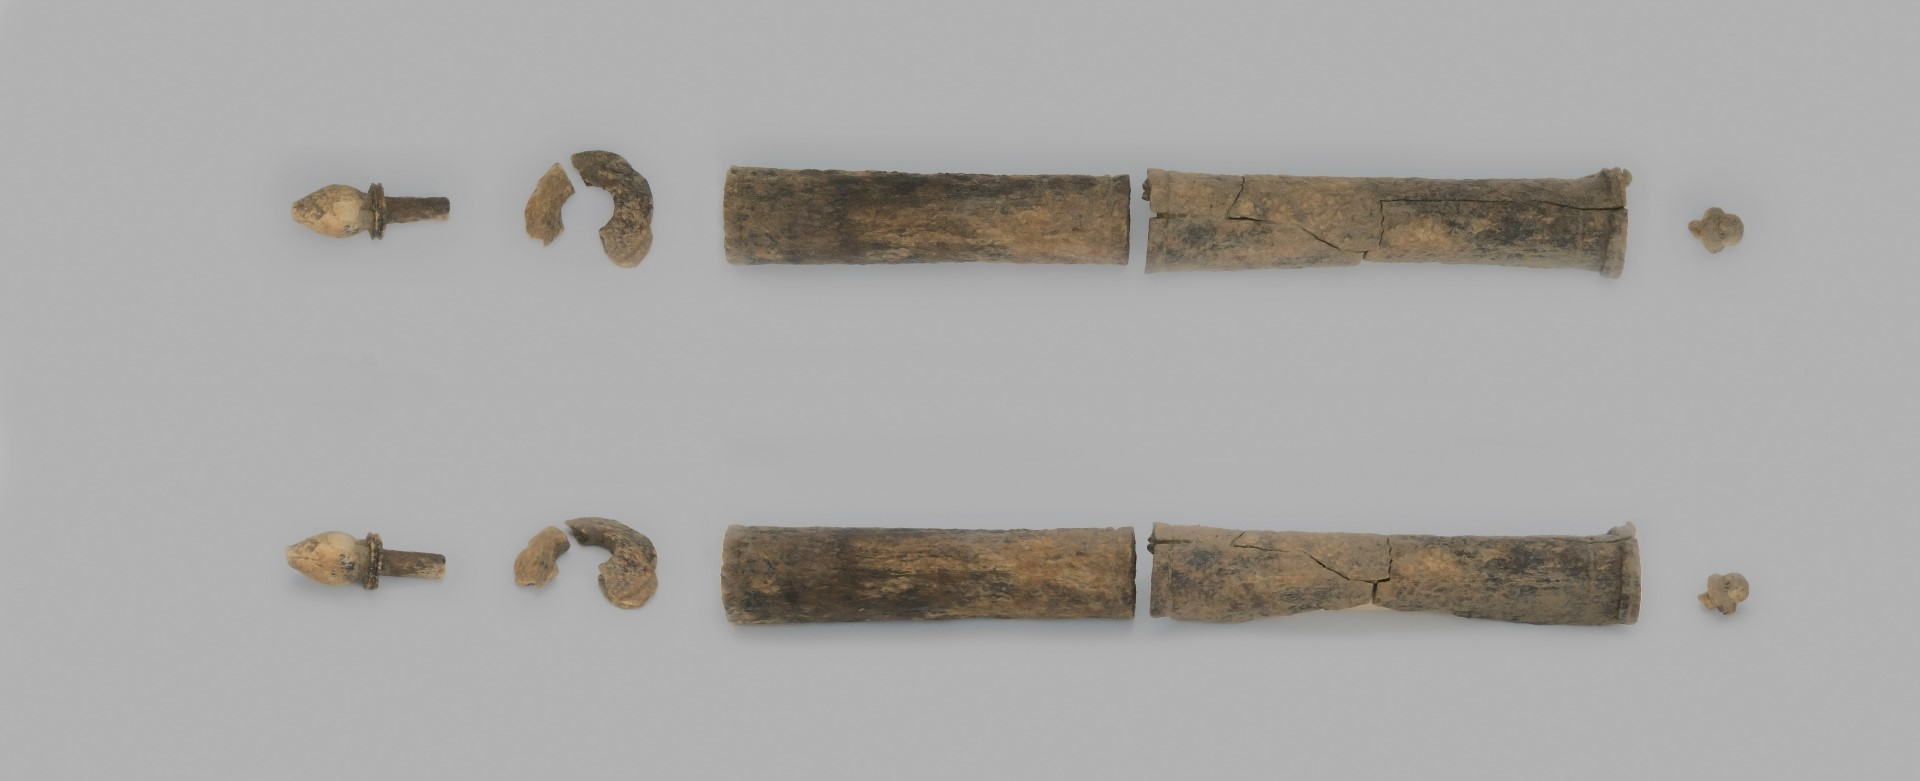 nr11-Romeinse perkamenthouder-ADC ArcheoProjecten-ARCHO